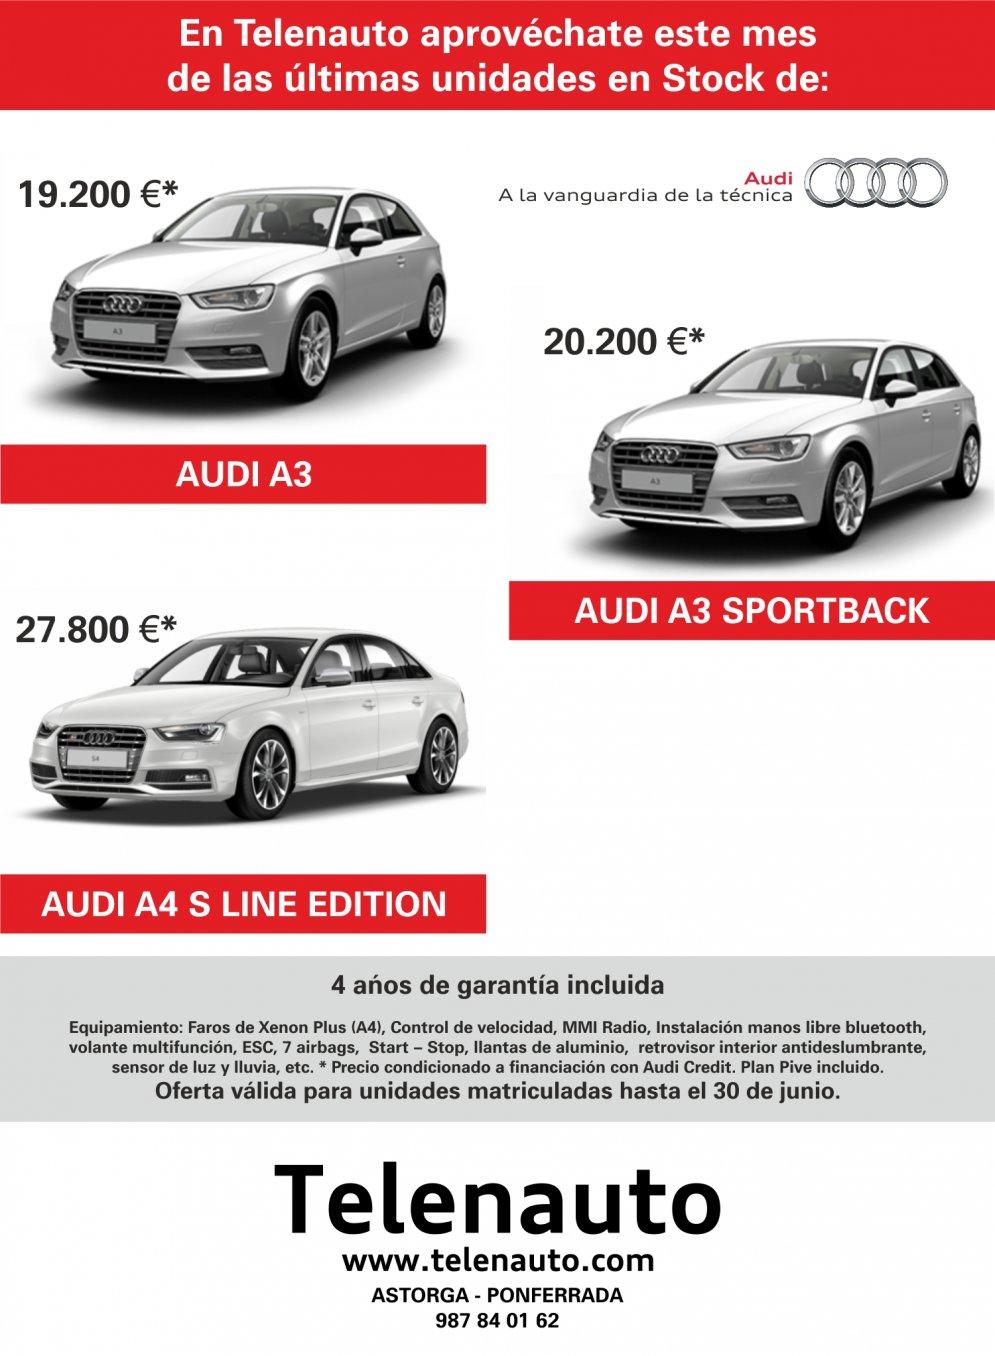 Audi A3, A3 sportback y A4 sline edition en stock